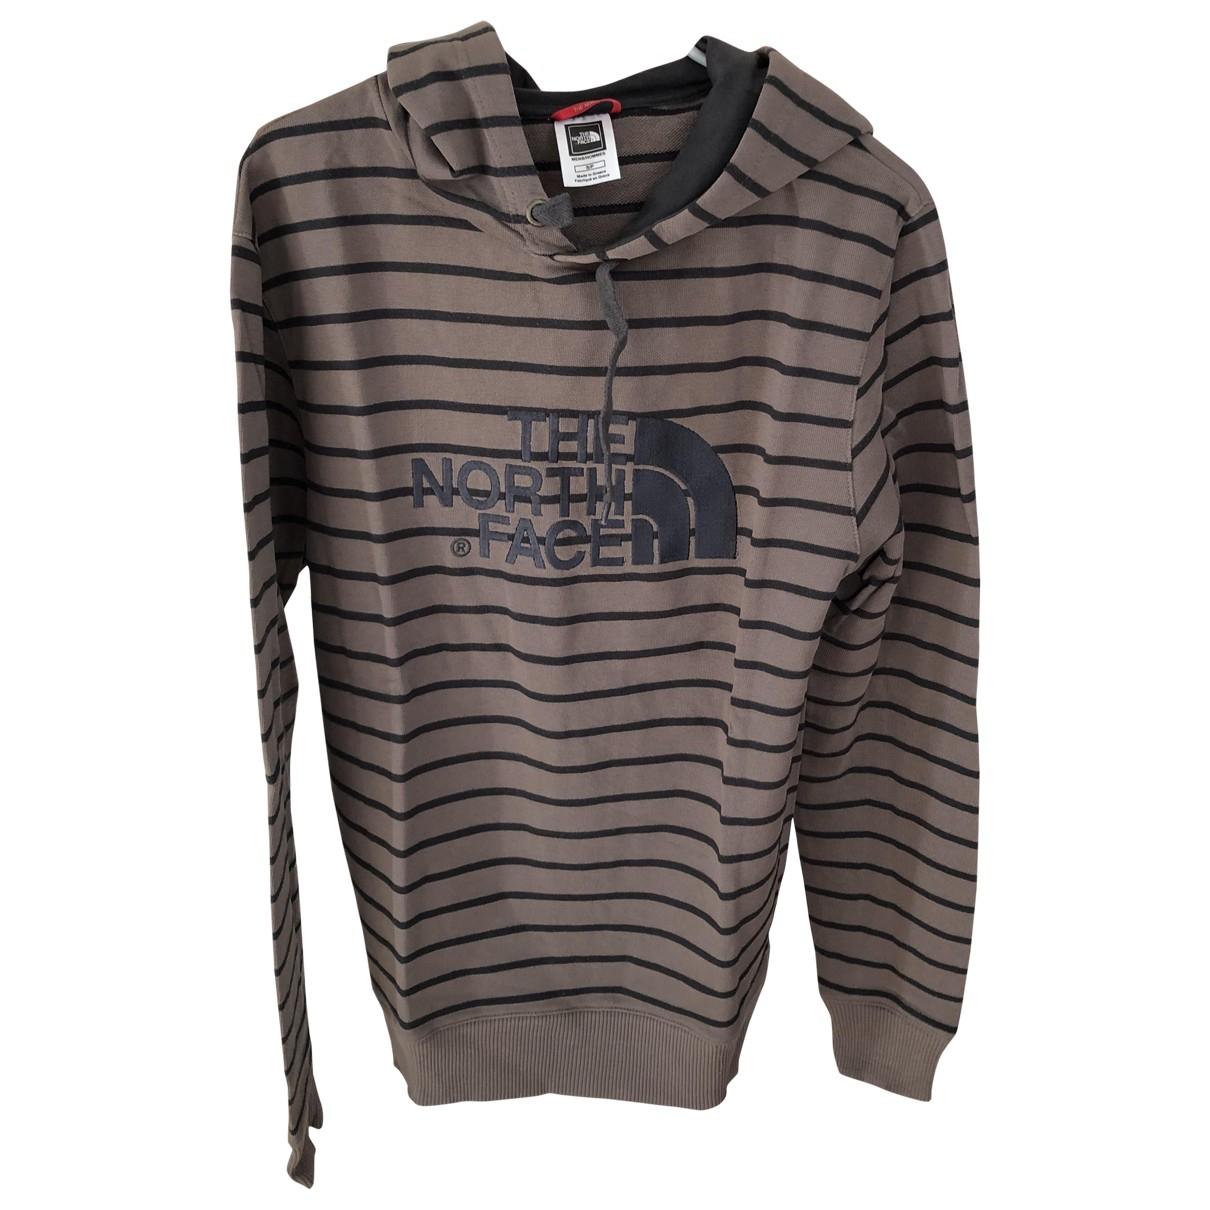 The North Face N Khaki Cotton Knitwear & Sweatshirts for Men S International